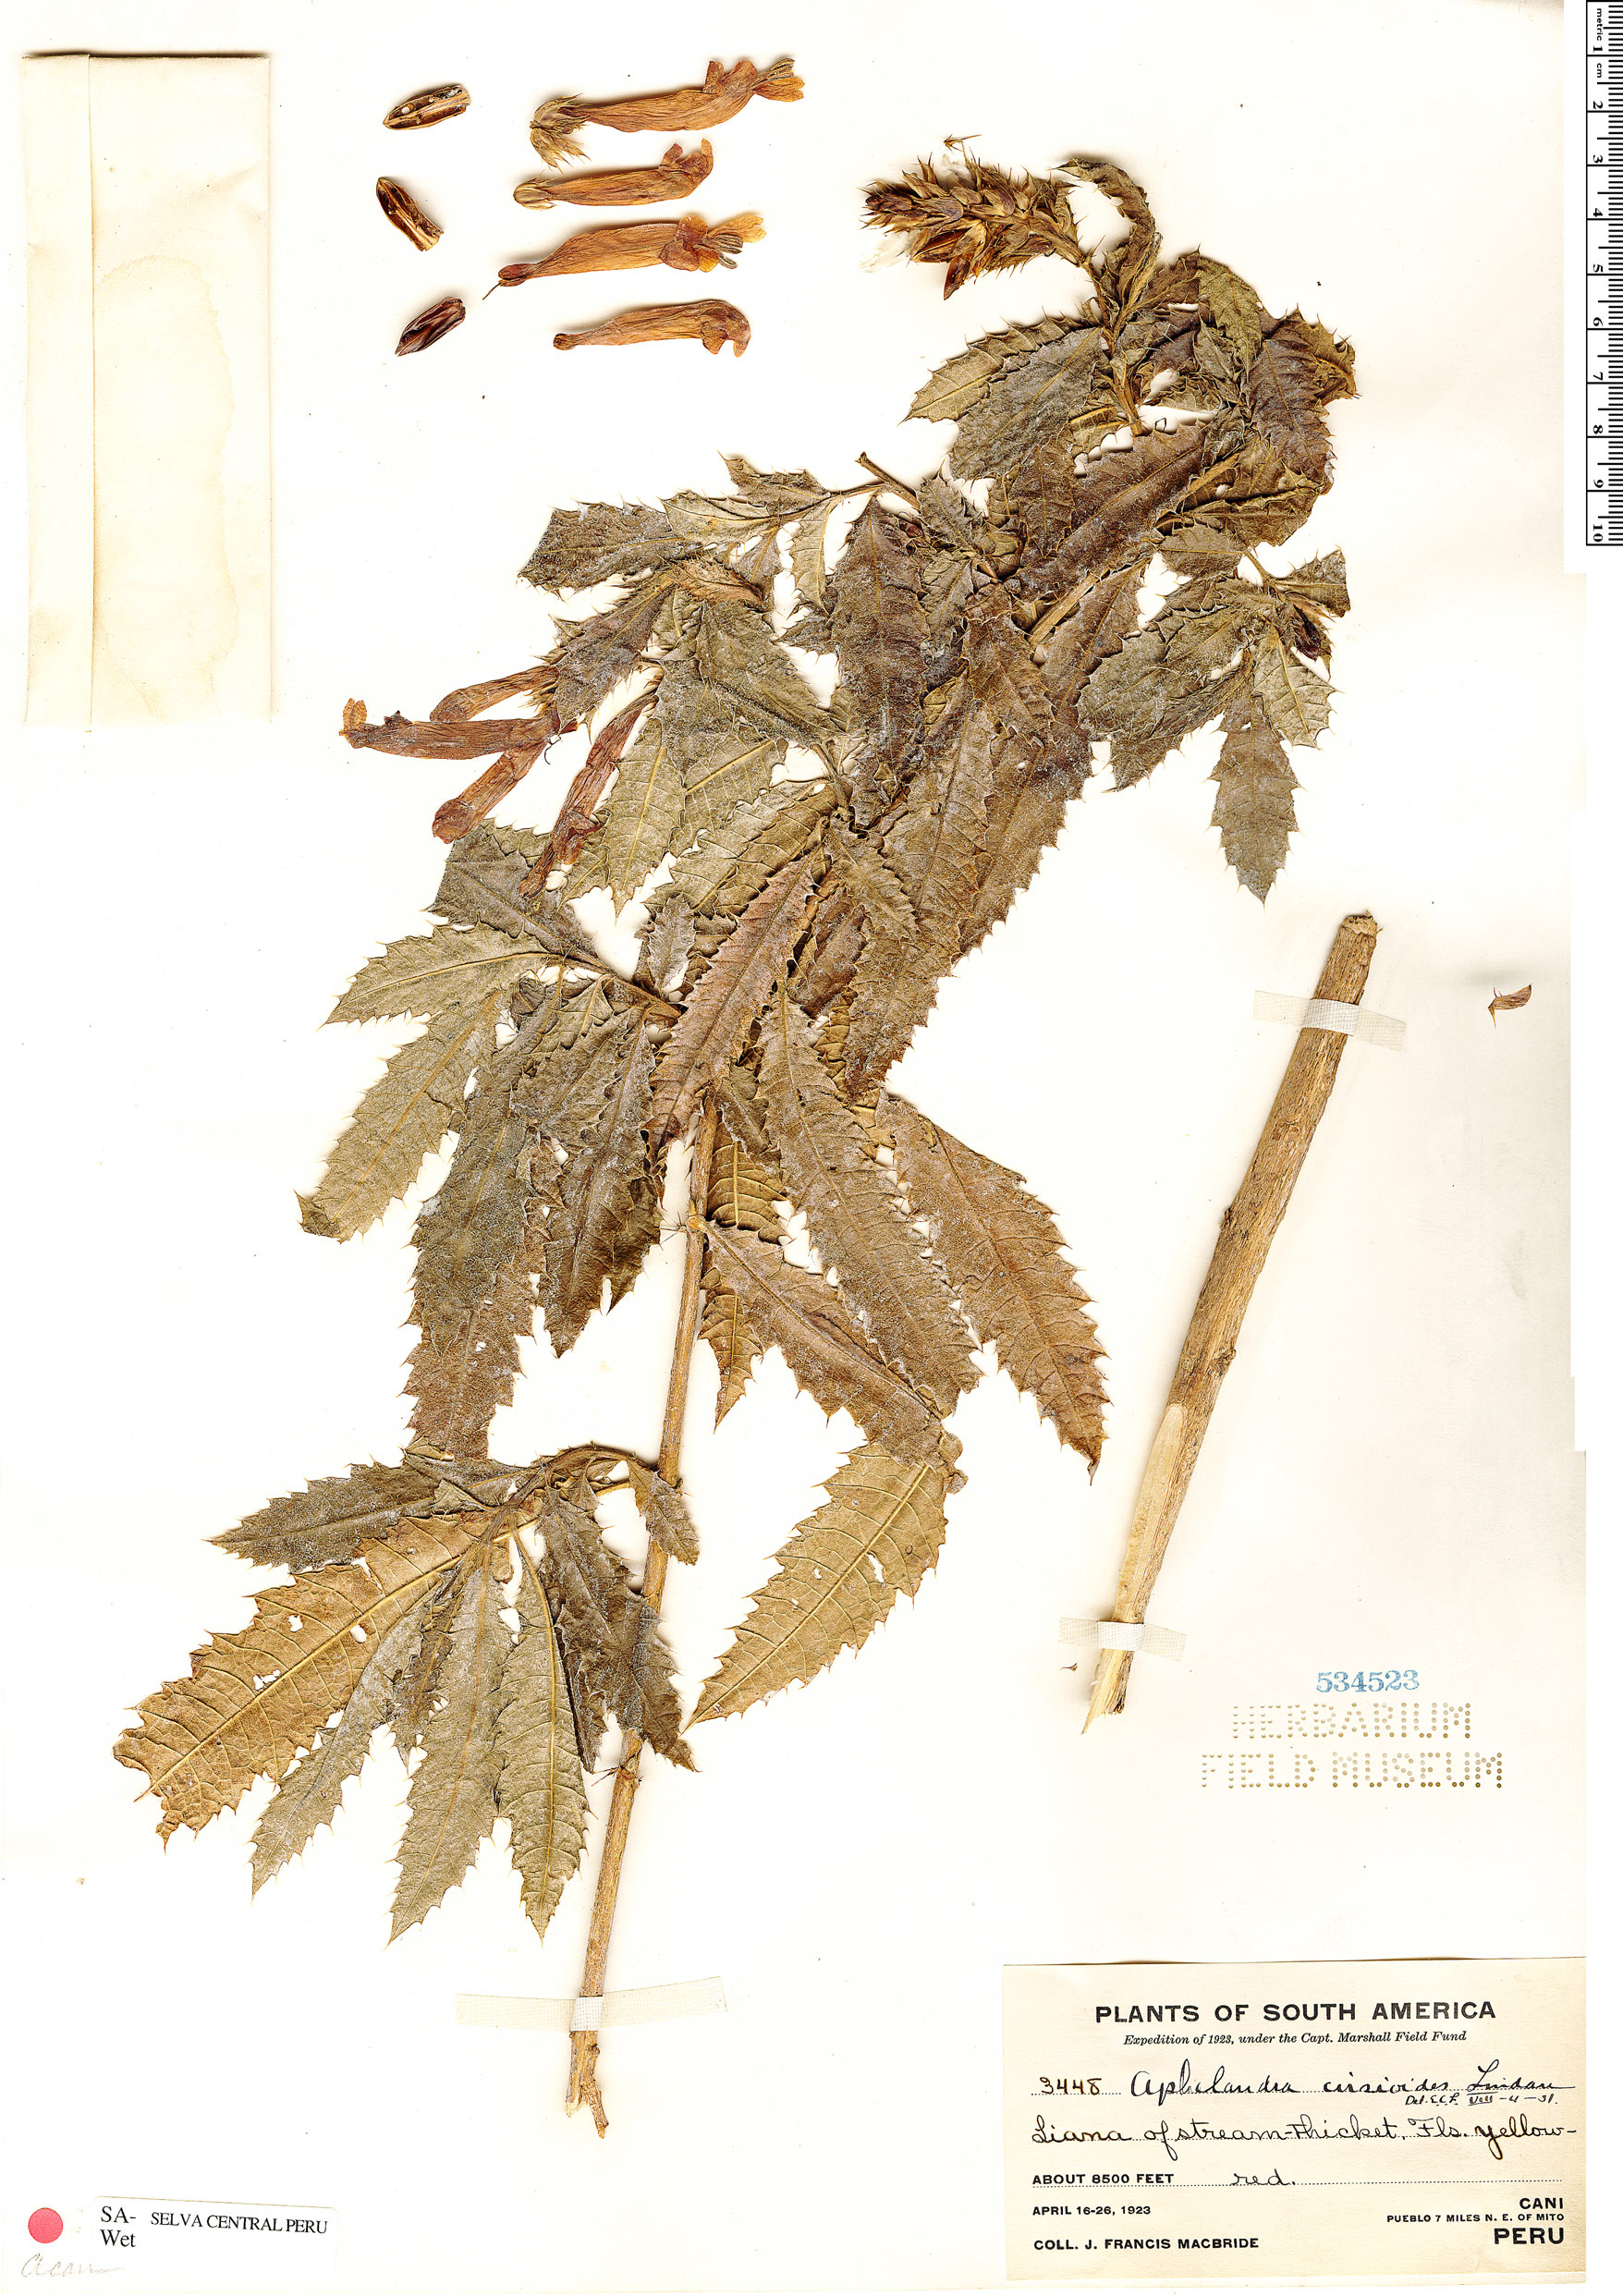 Espécimen: Aphelandra cirsioides